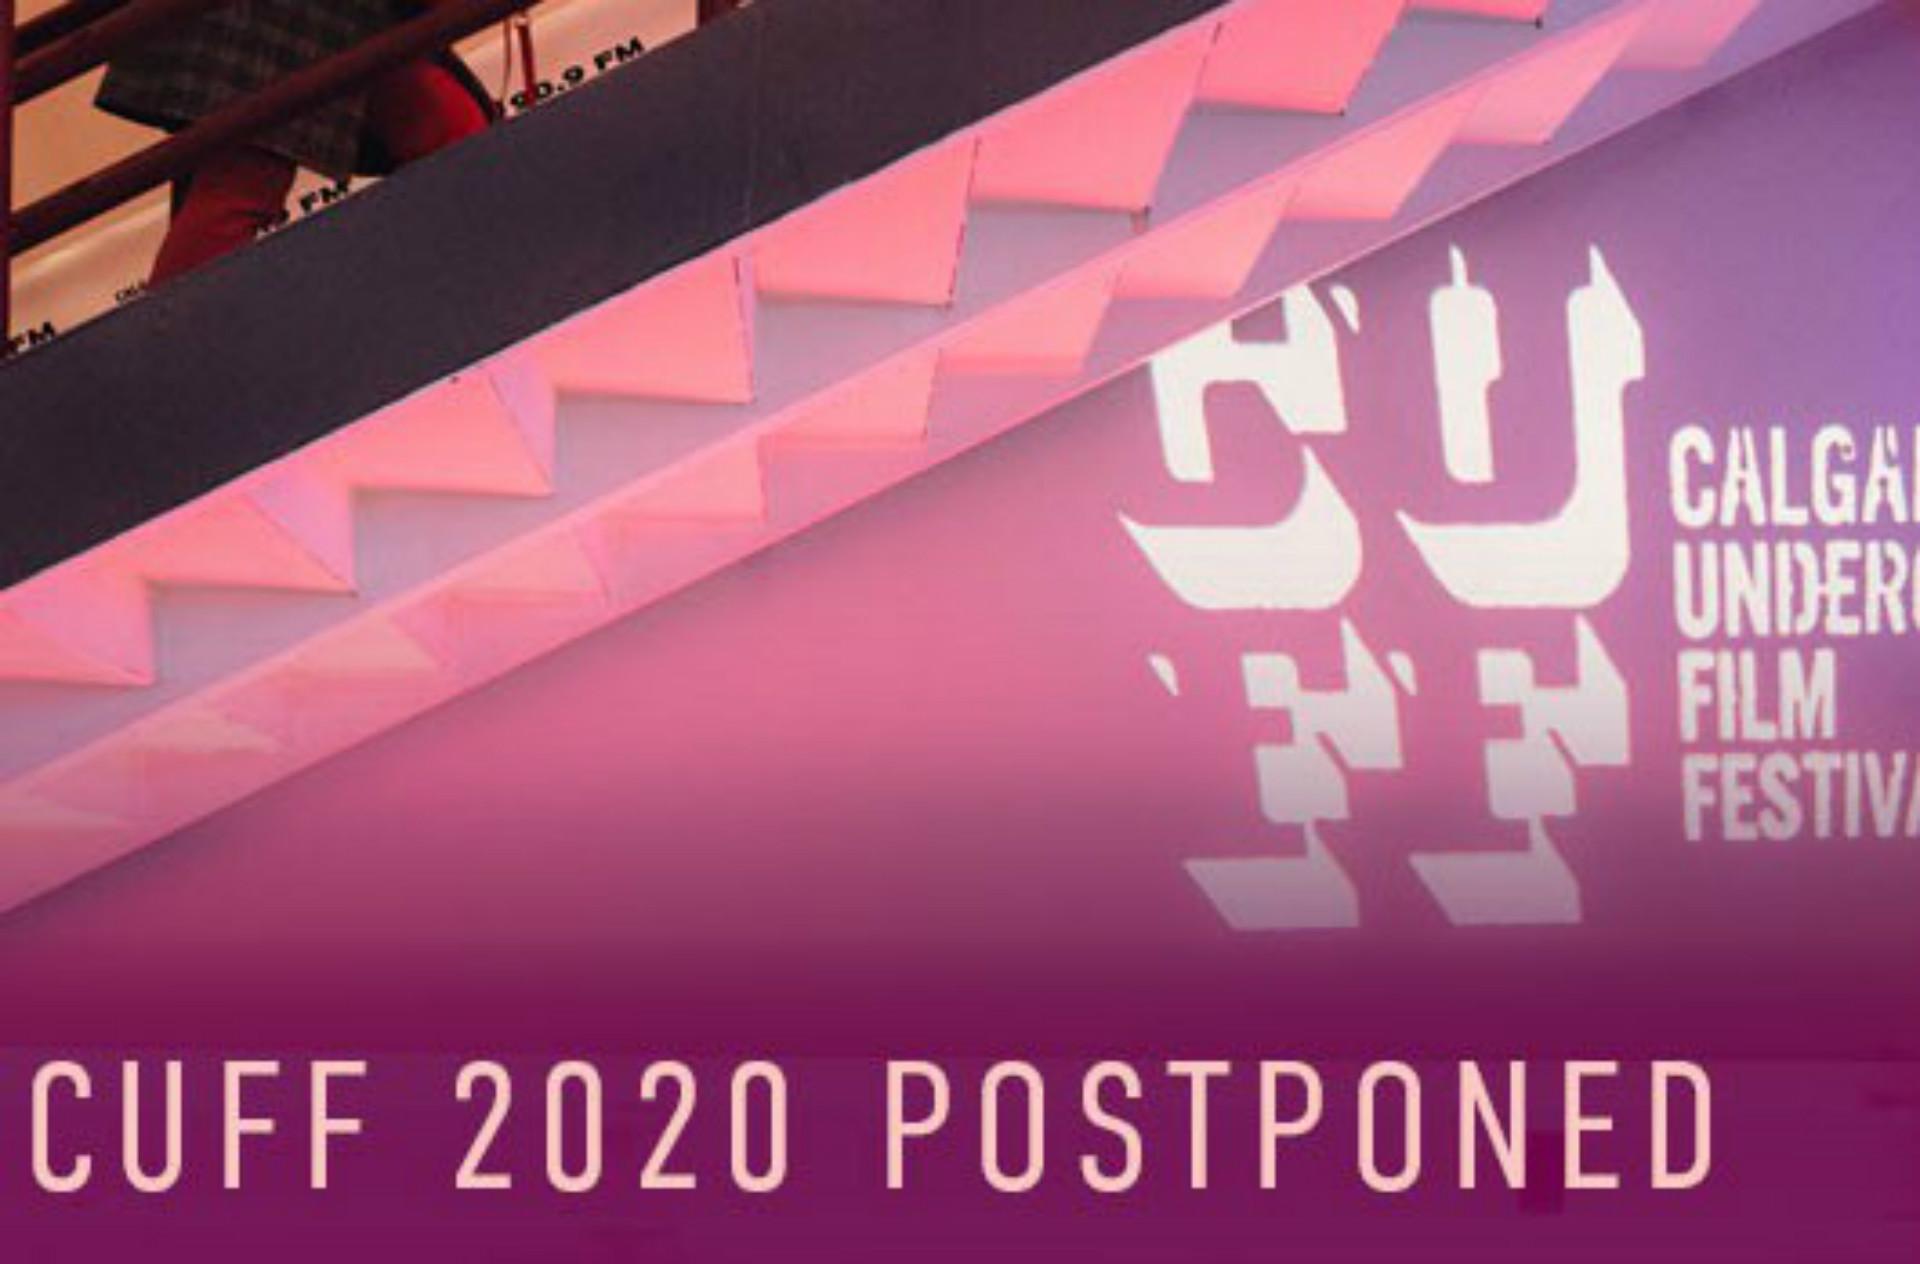 Calgary Underground Film Festival 2020 Postponed